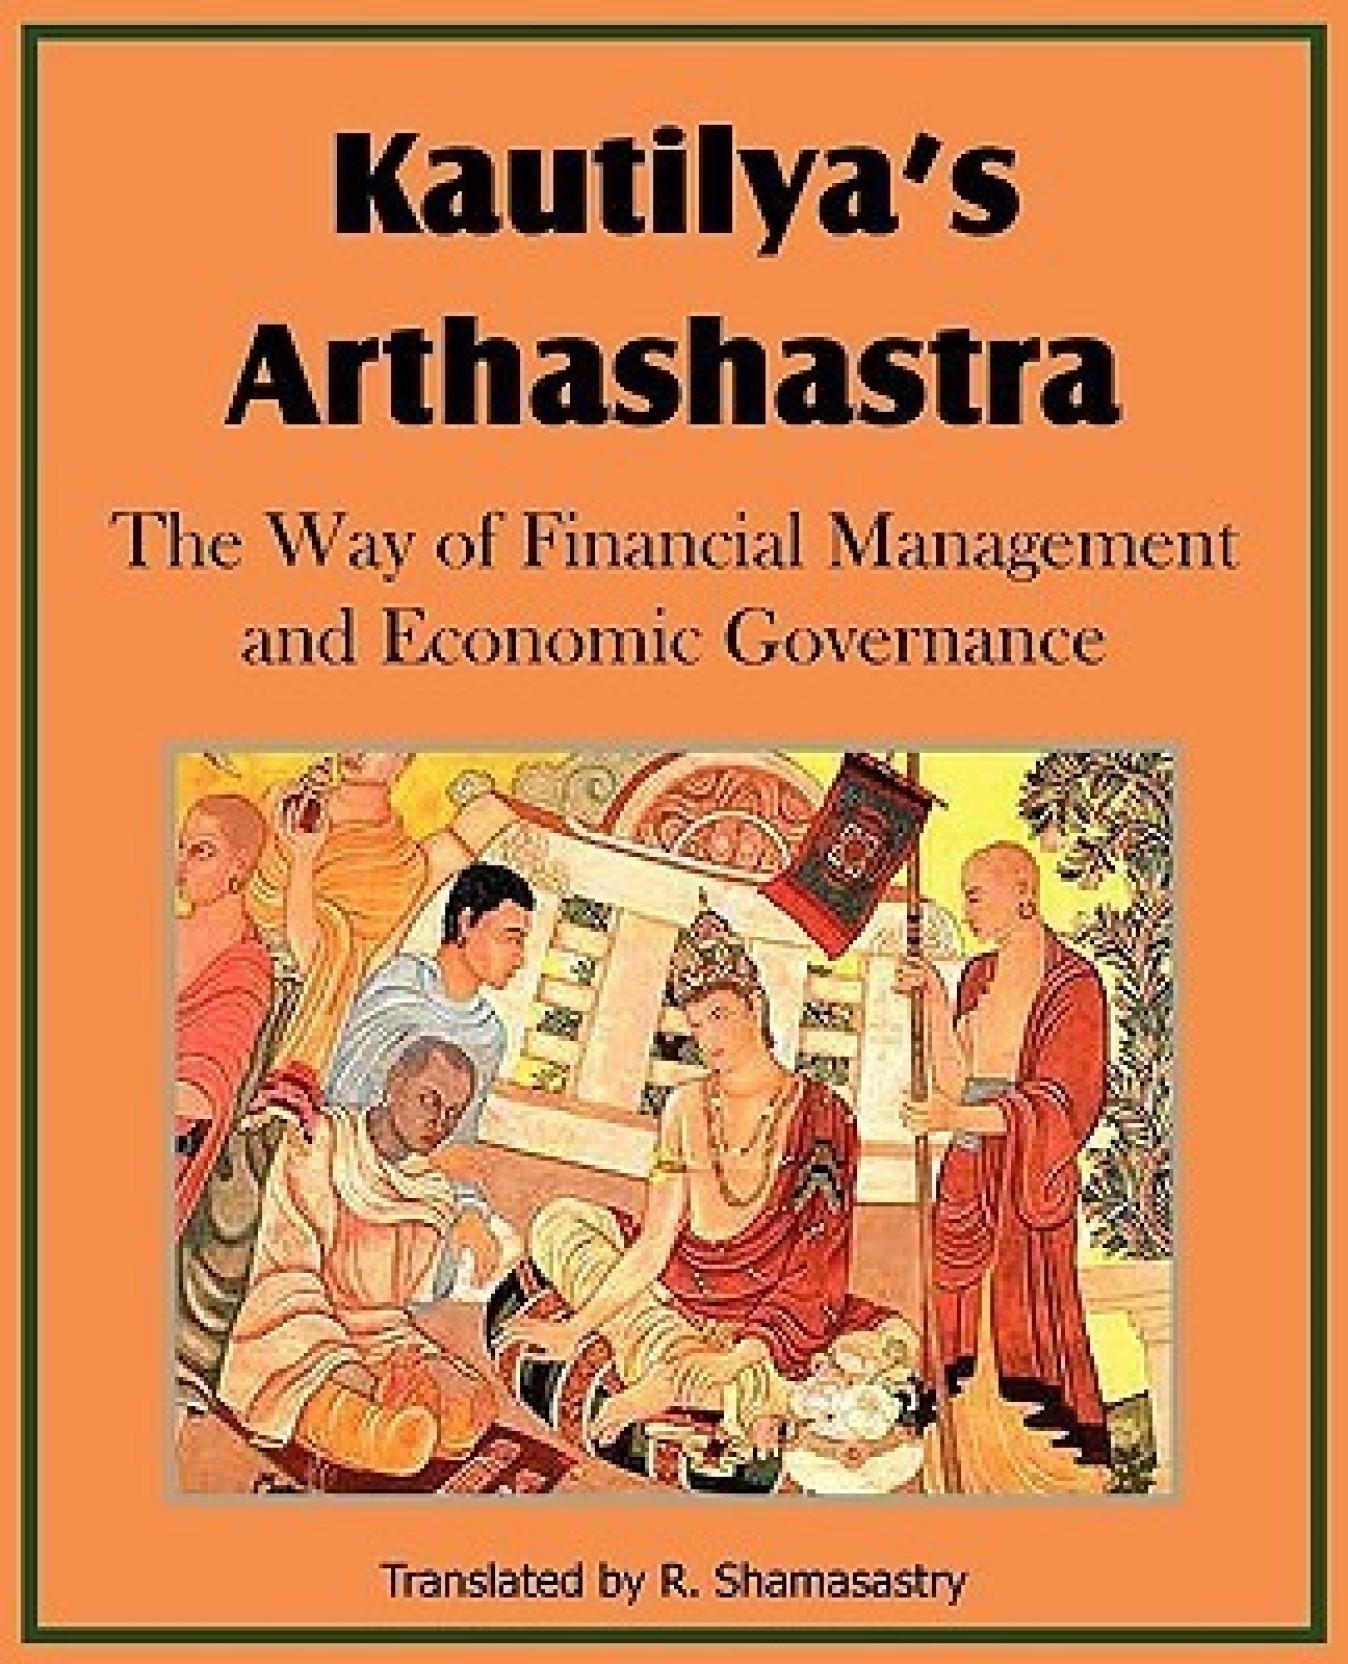 kautilya s arthasastra statecraft Arthashastra and its relevance in modern warfare and counterinsurgency/counterterrorism philosophy and that of statecraft kautilya arthasastra.